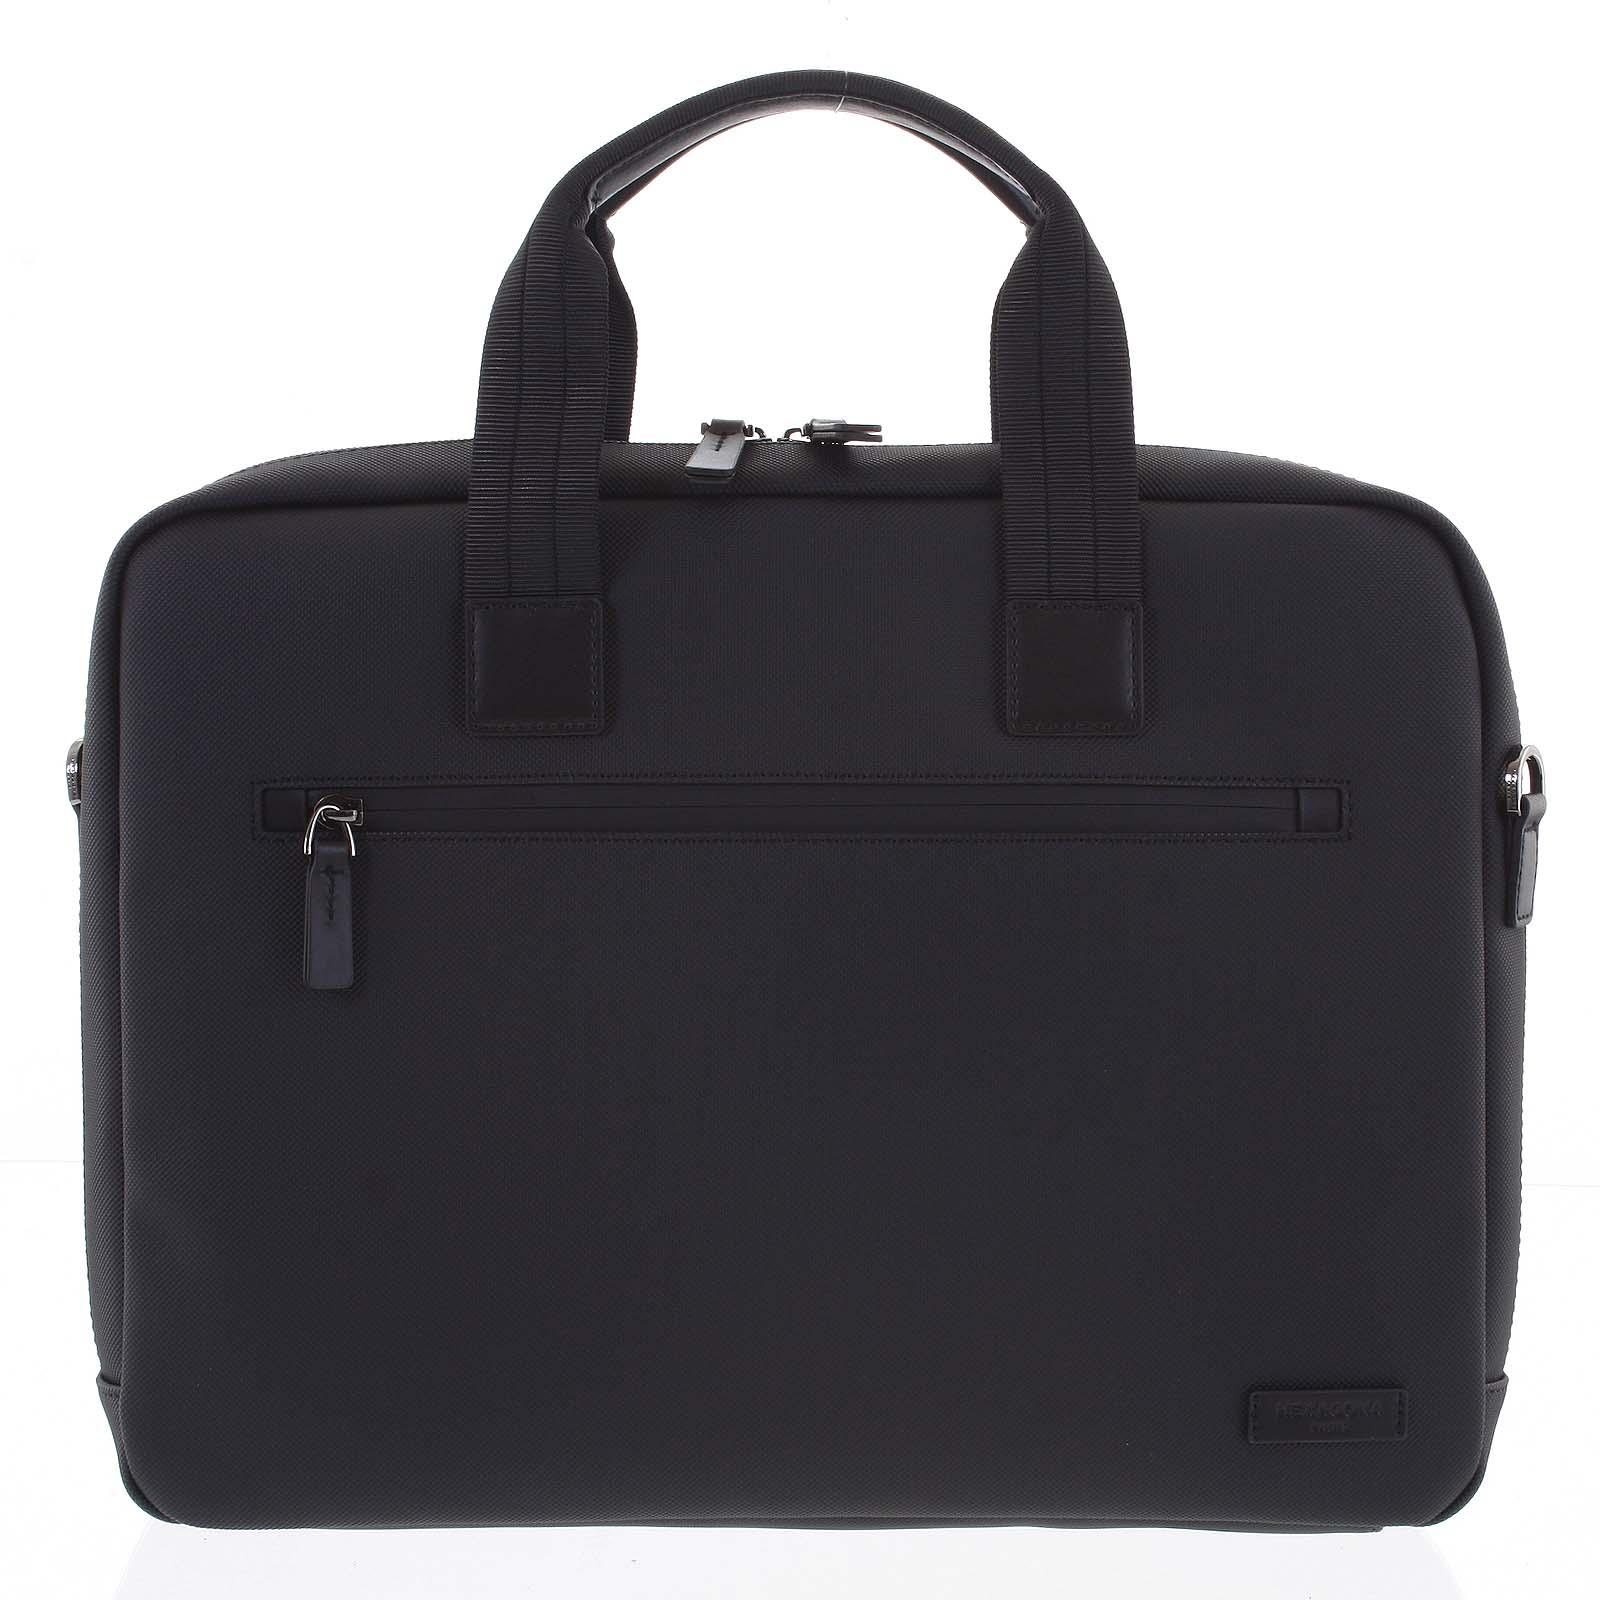 Taška na notebook čierna - Hexagona Aswin čierna